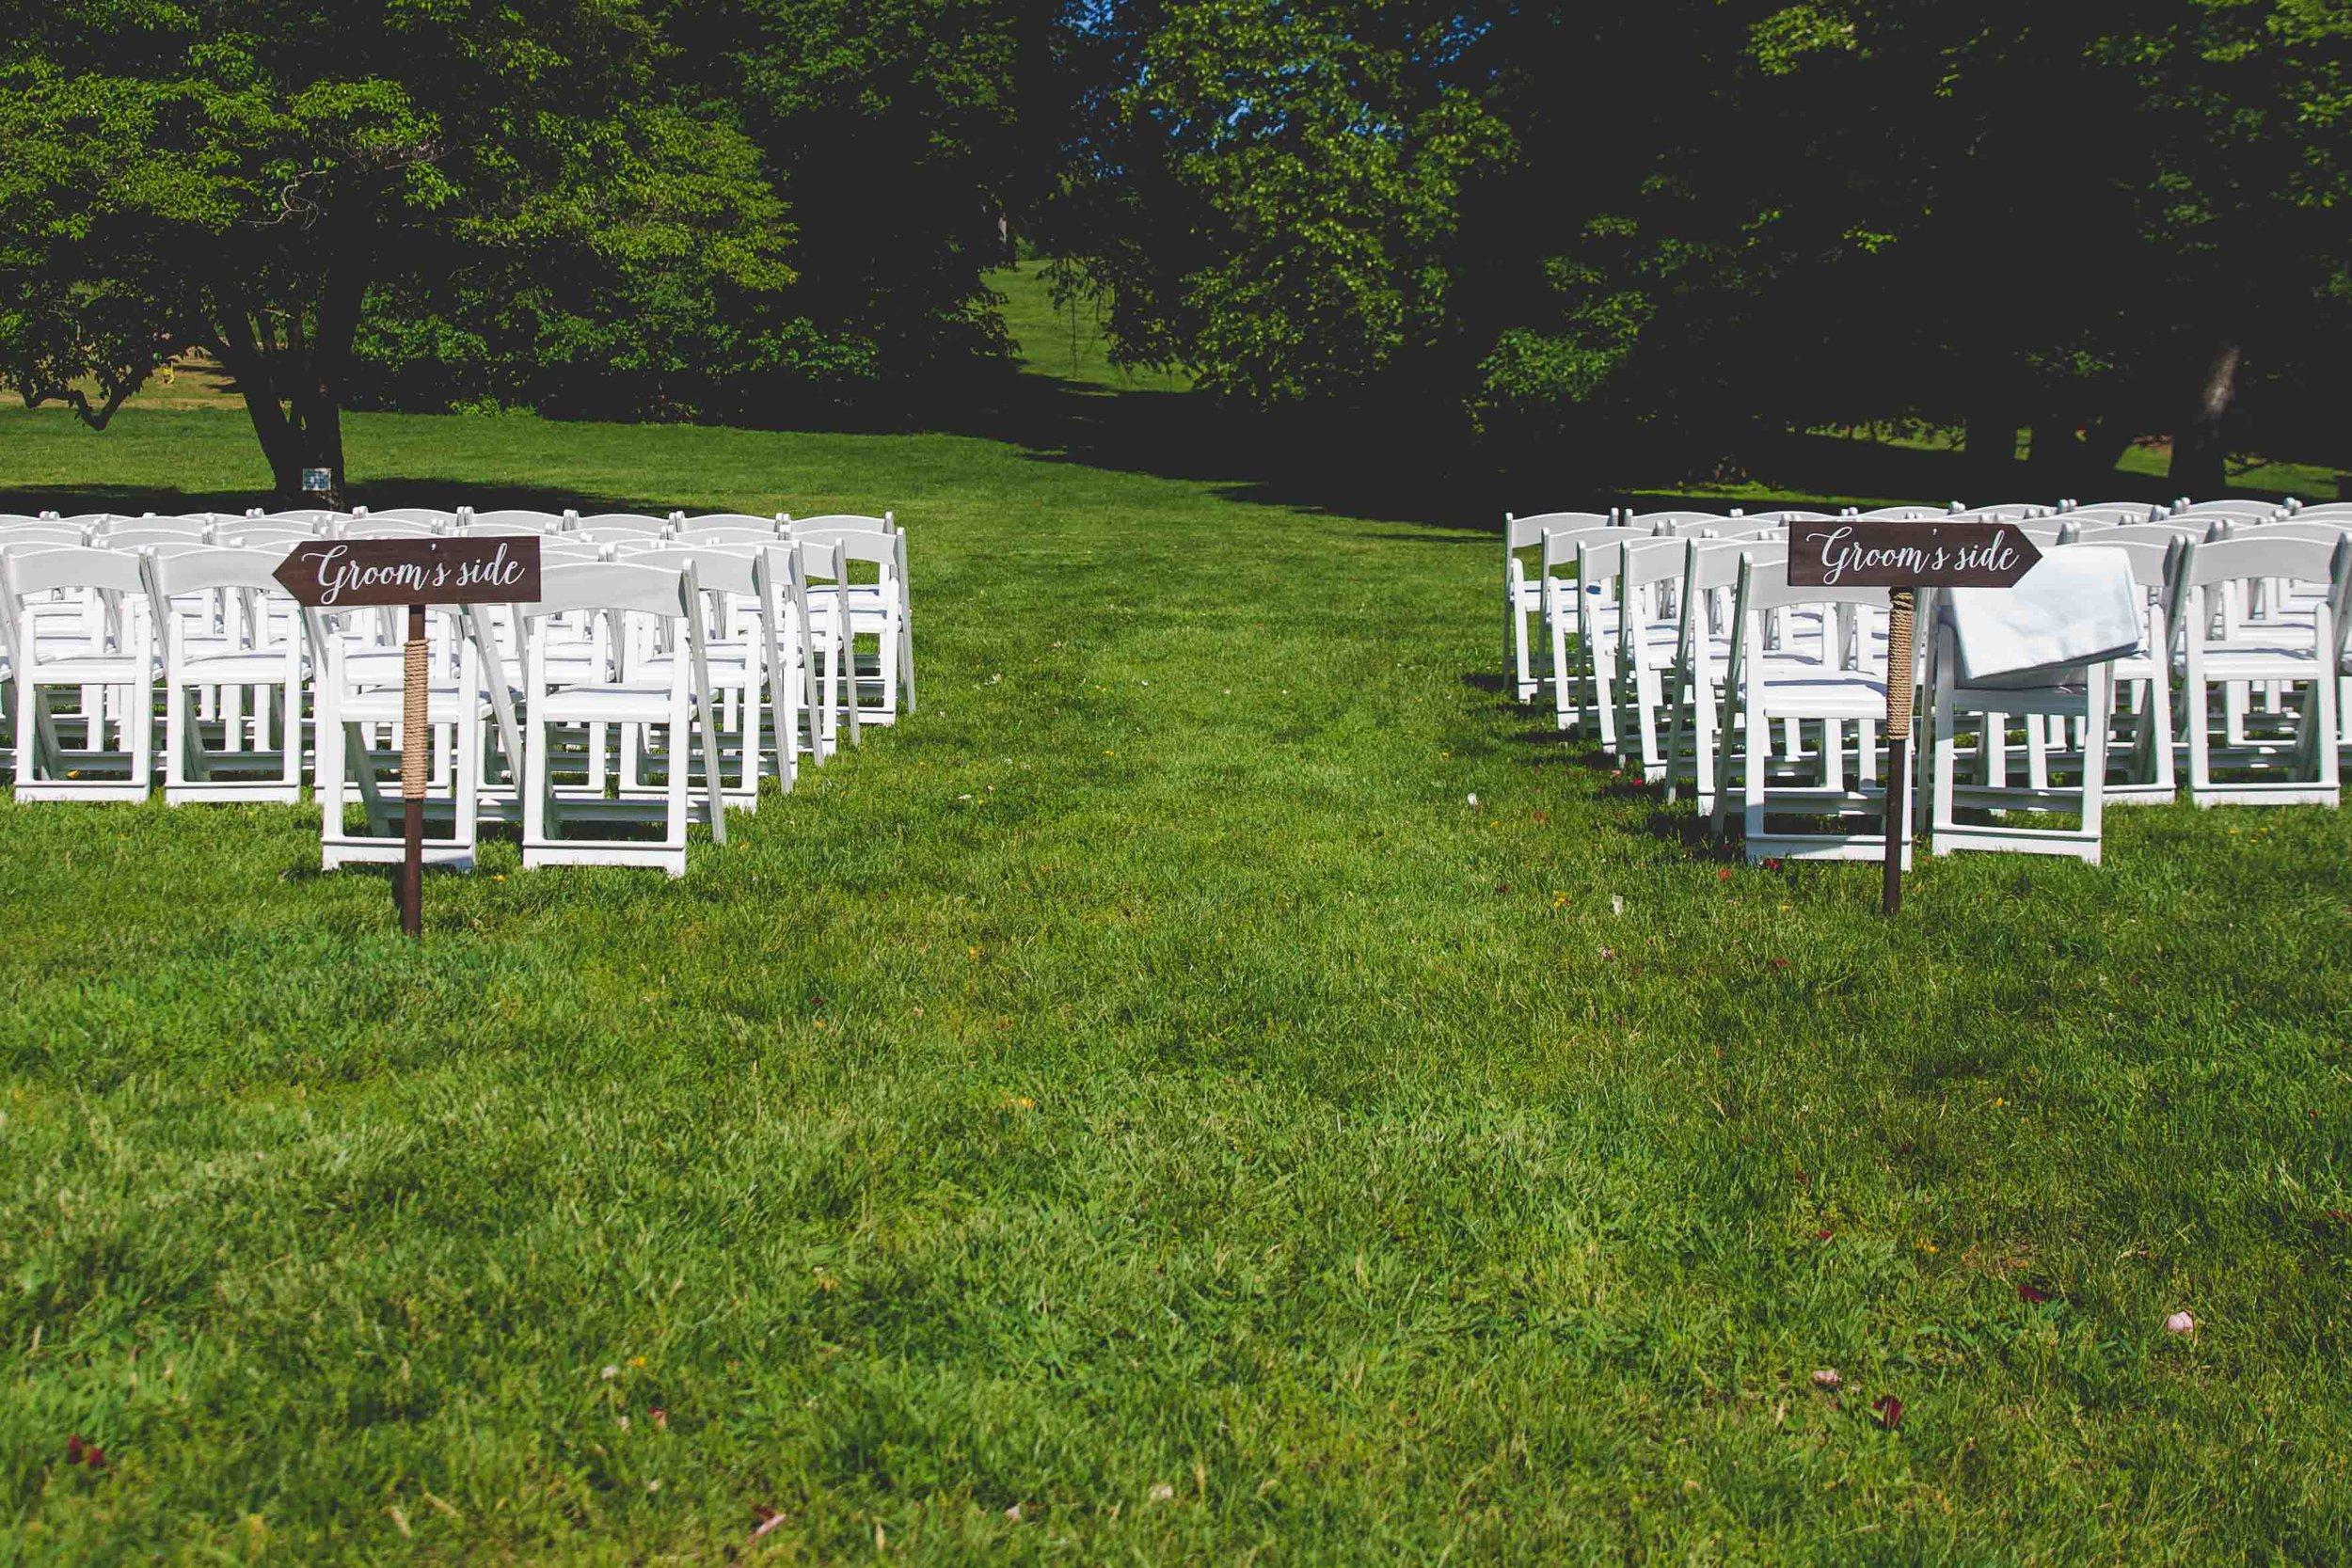 lyndhurst-mansion-amazing-gay-wedding-1.jpg